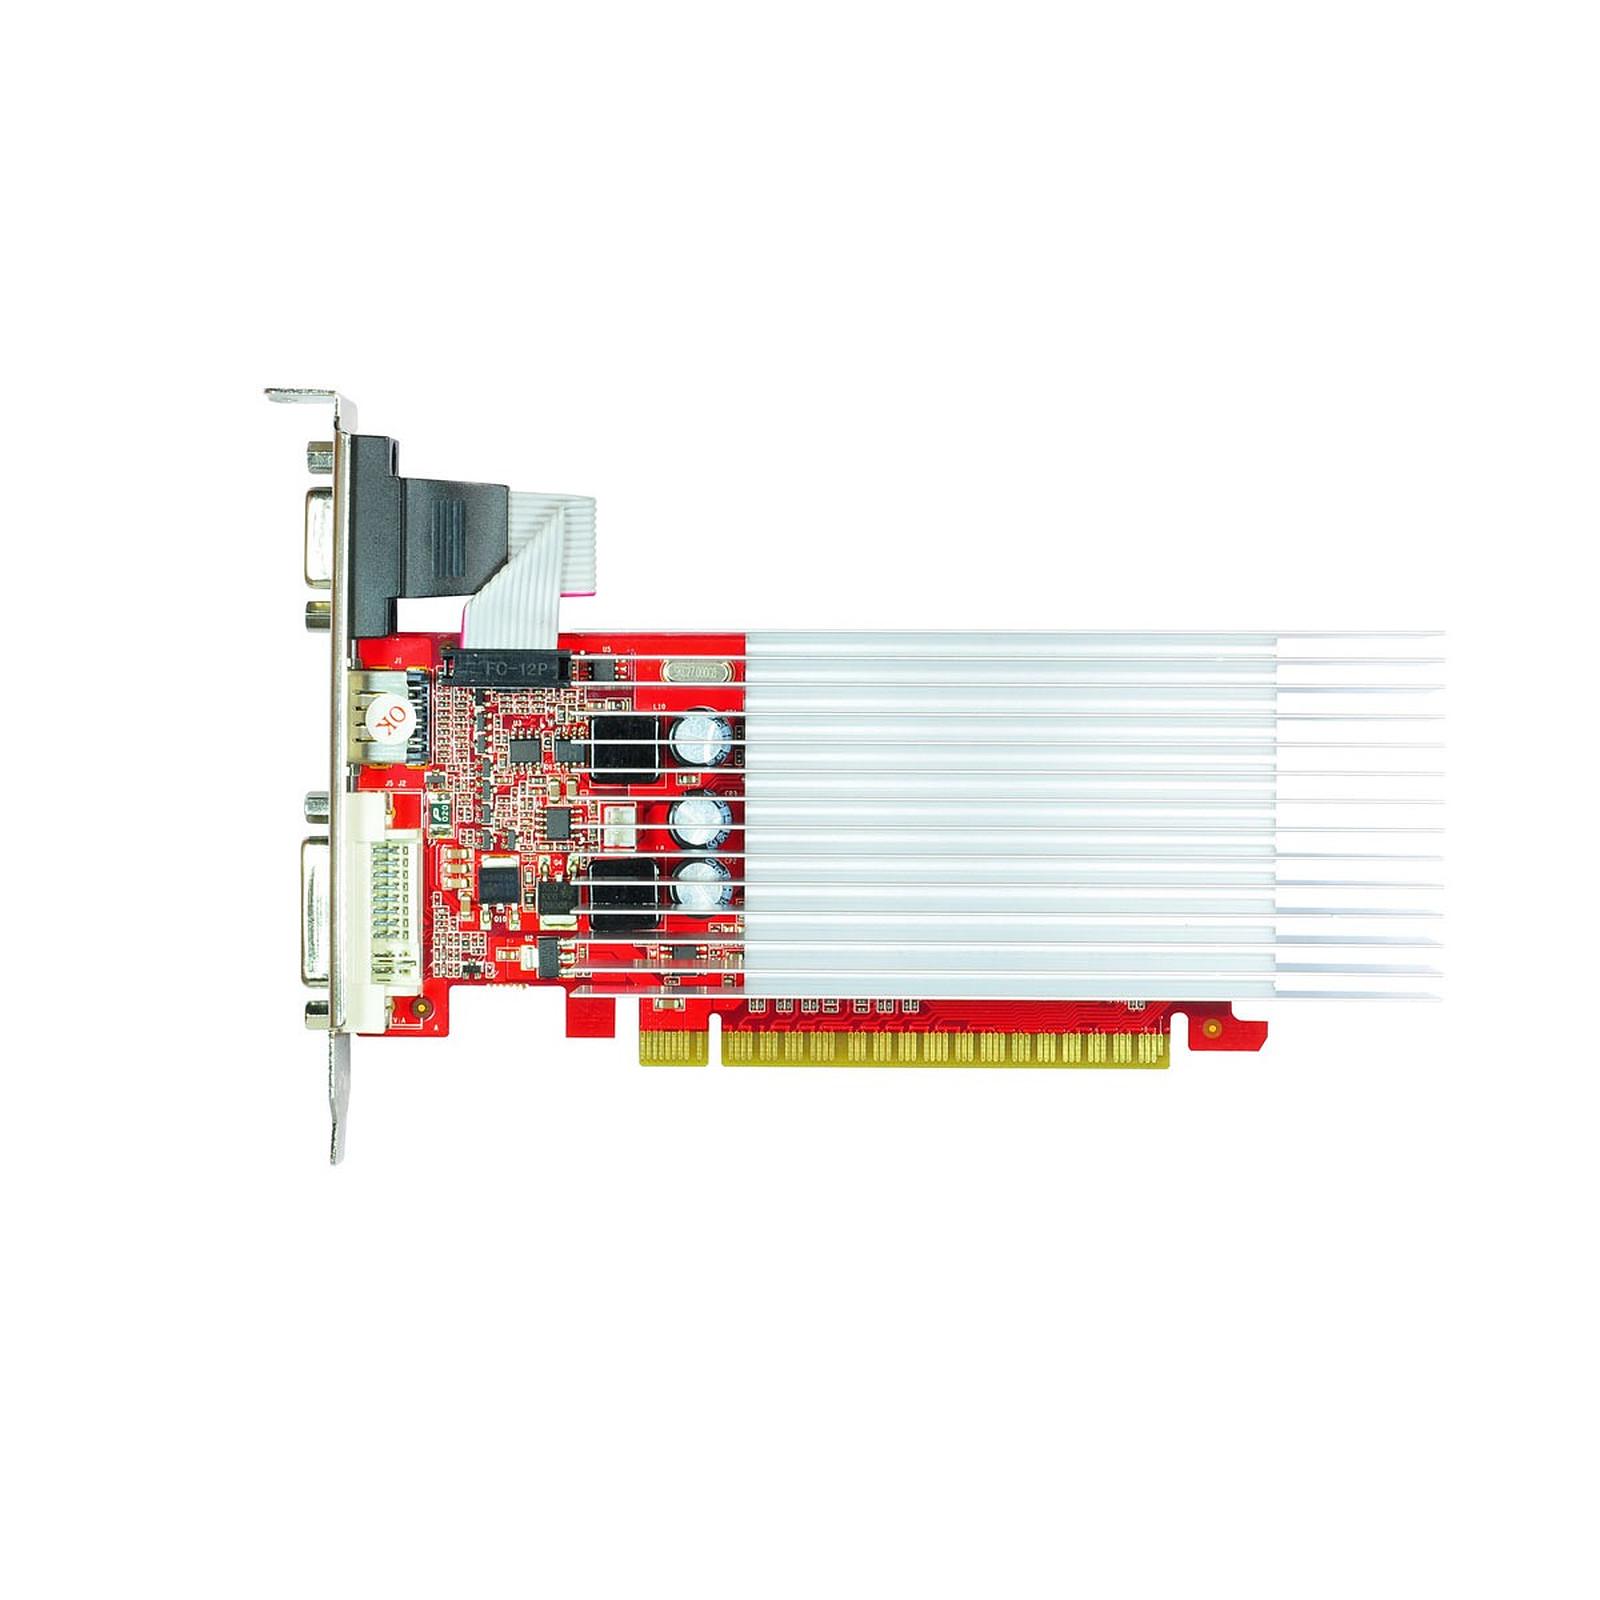 Gainward GeForce GT 520 1GB SilentFX